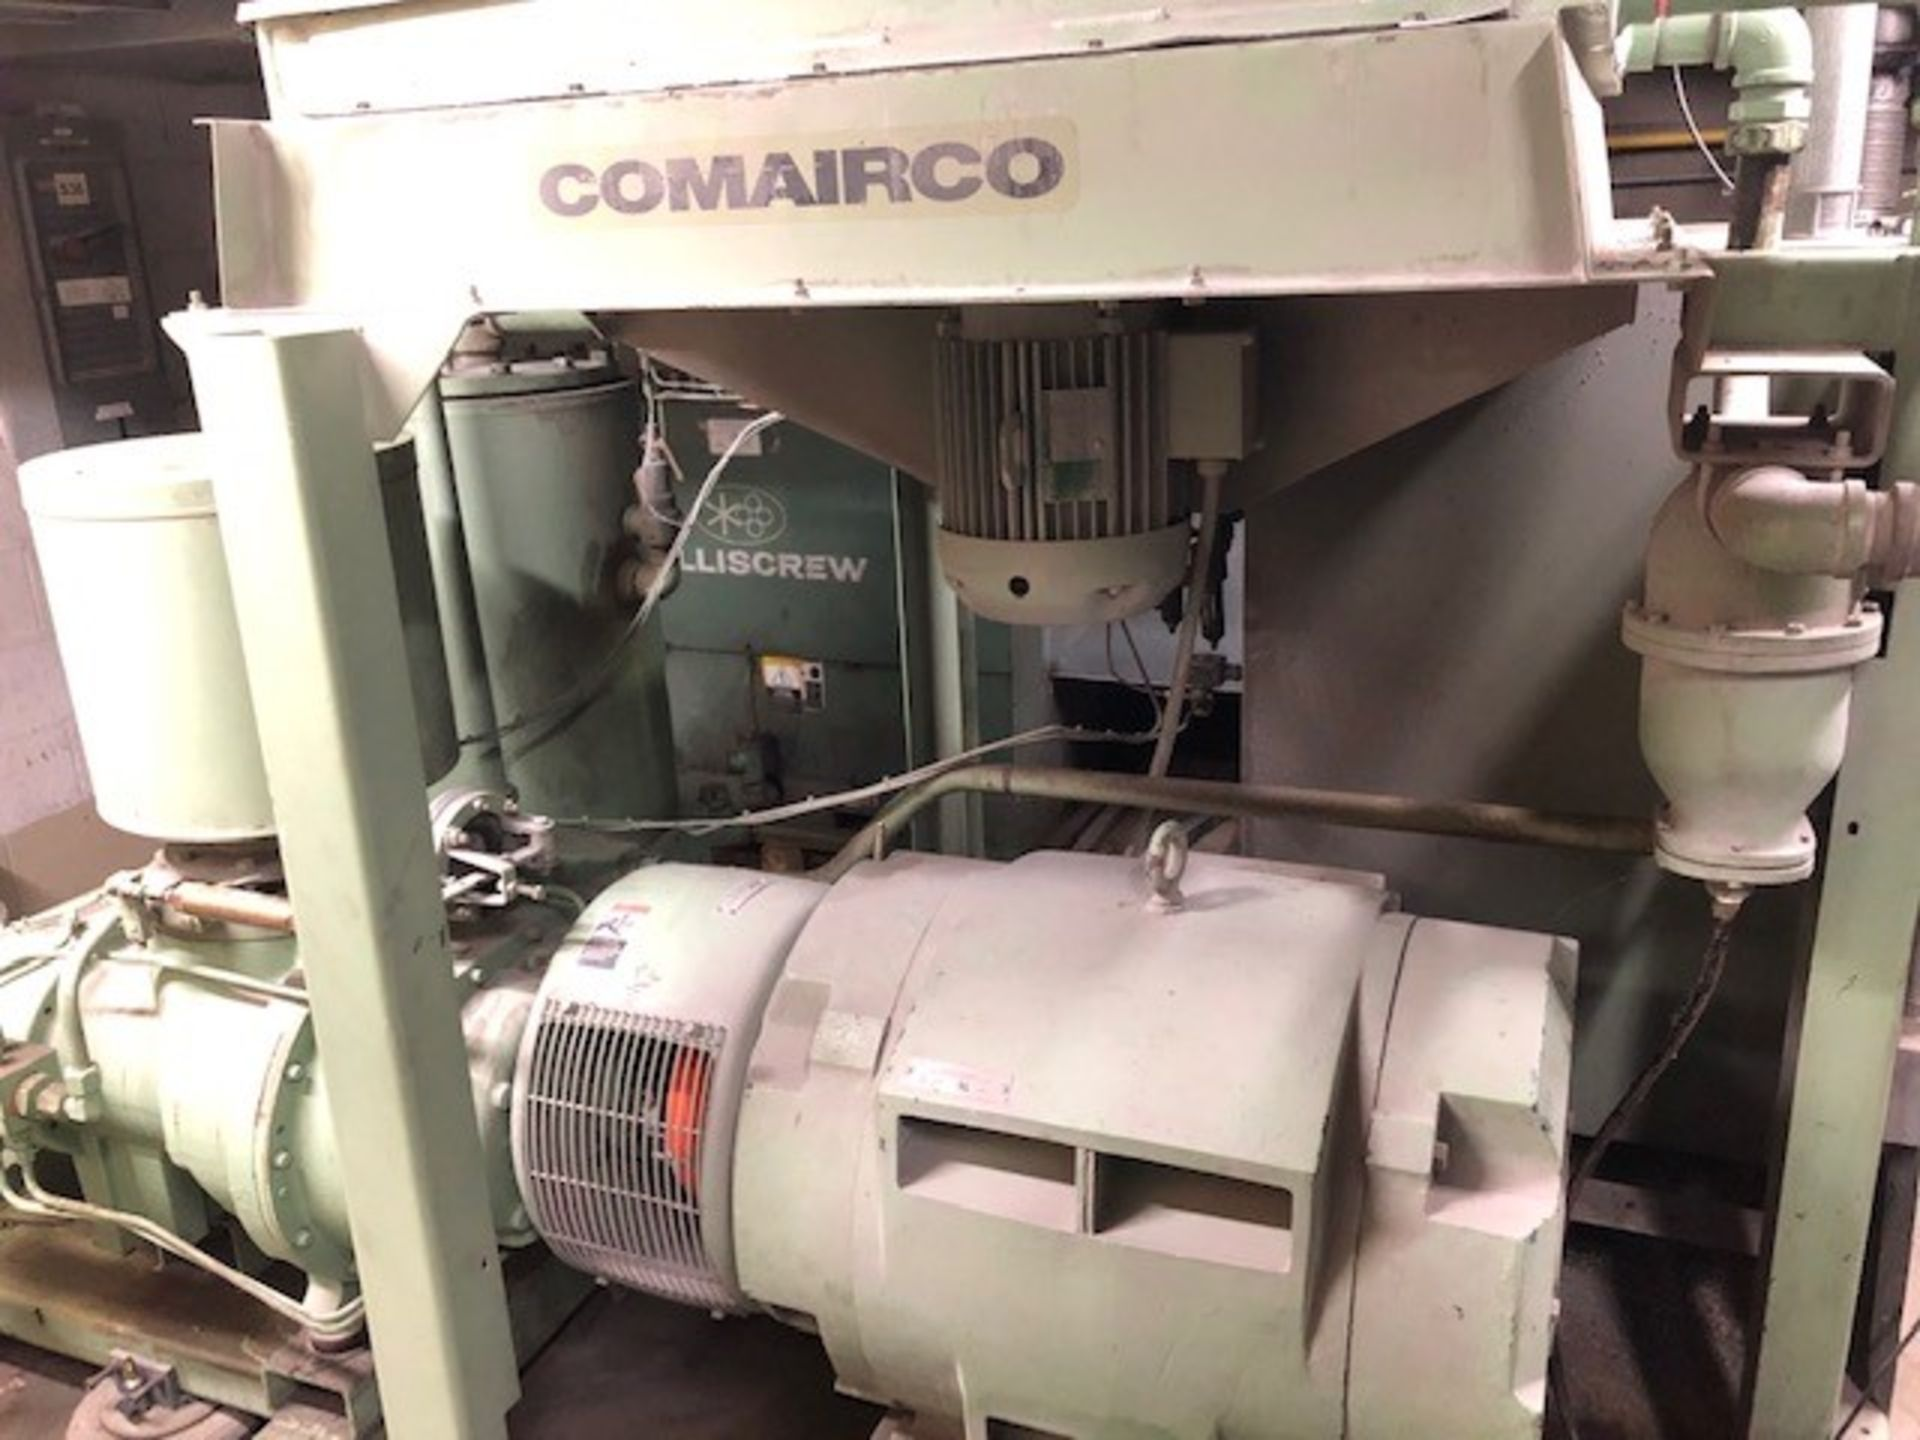 Lot 48 - Air Compressor 150hp Sullair, Model: LS-20S-150H ACAC, s/n: 003-112279